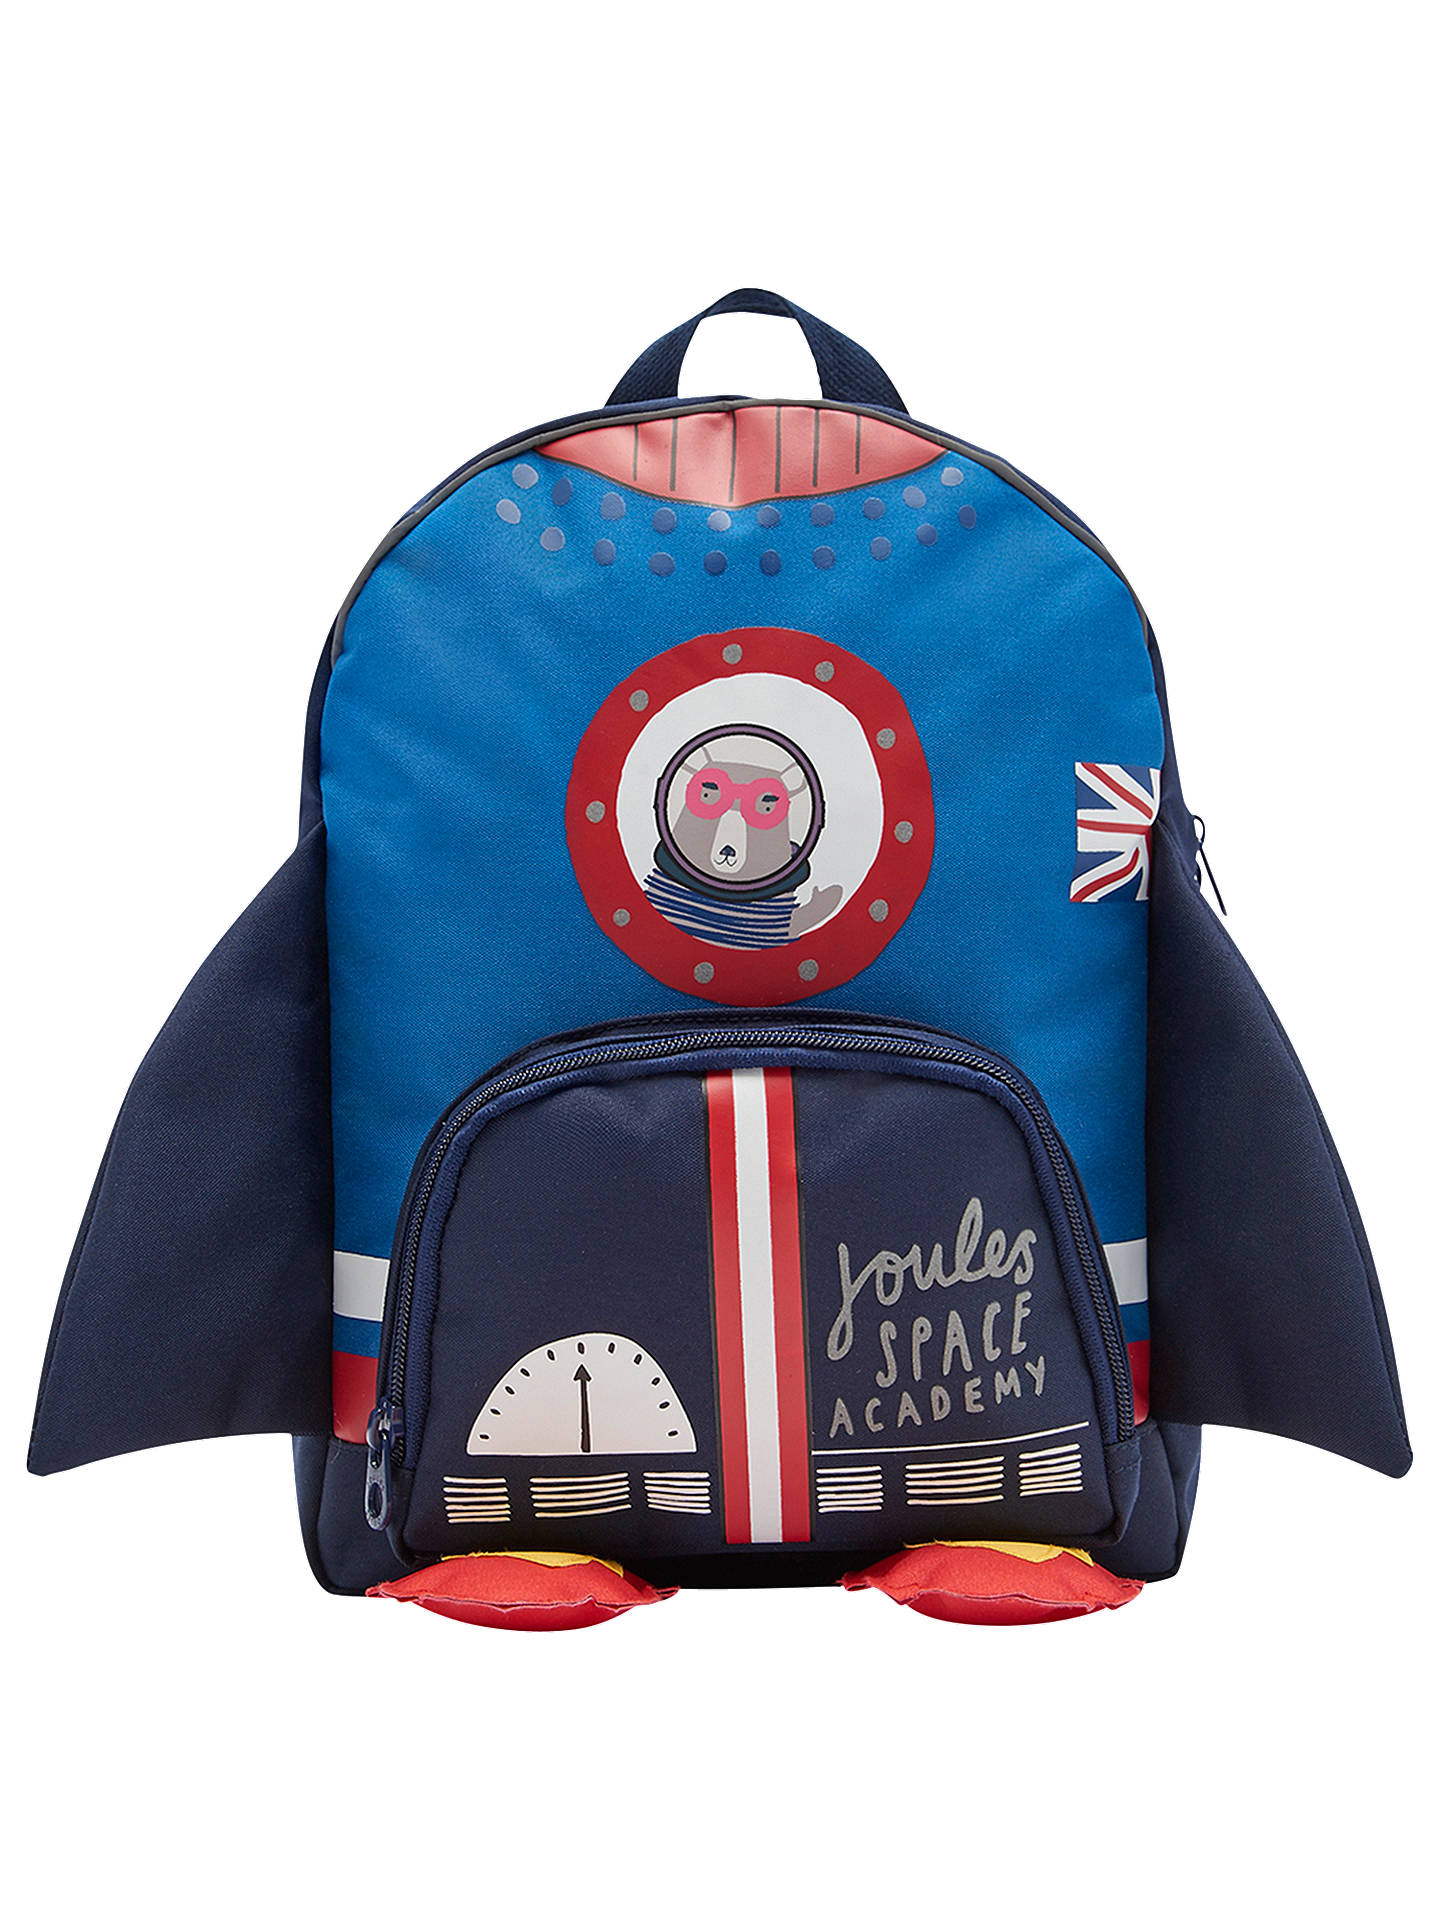 07028dd3e804 Joules Rocket Children's Backpack, Blue